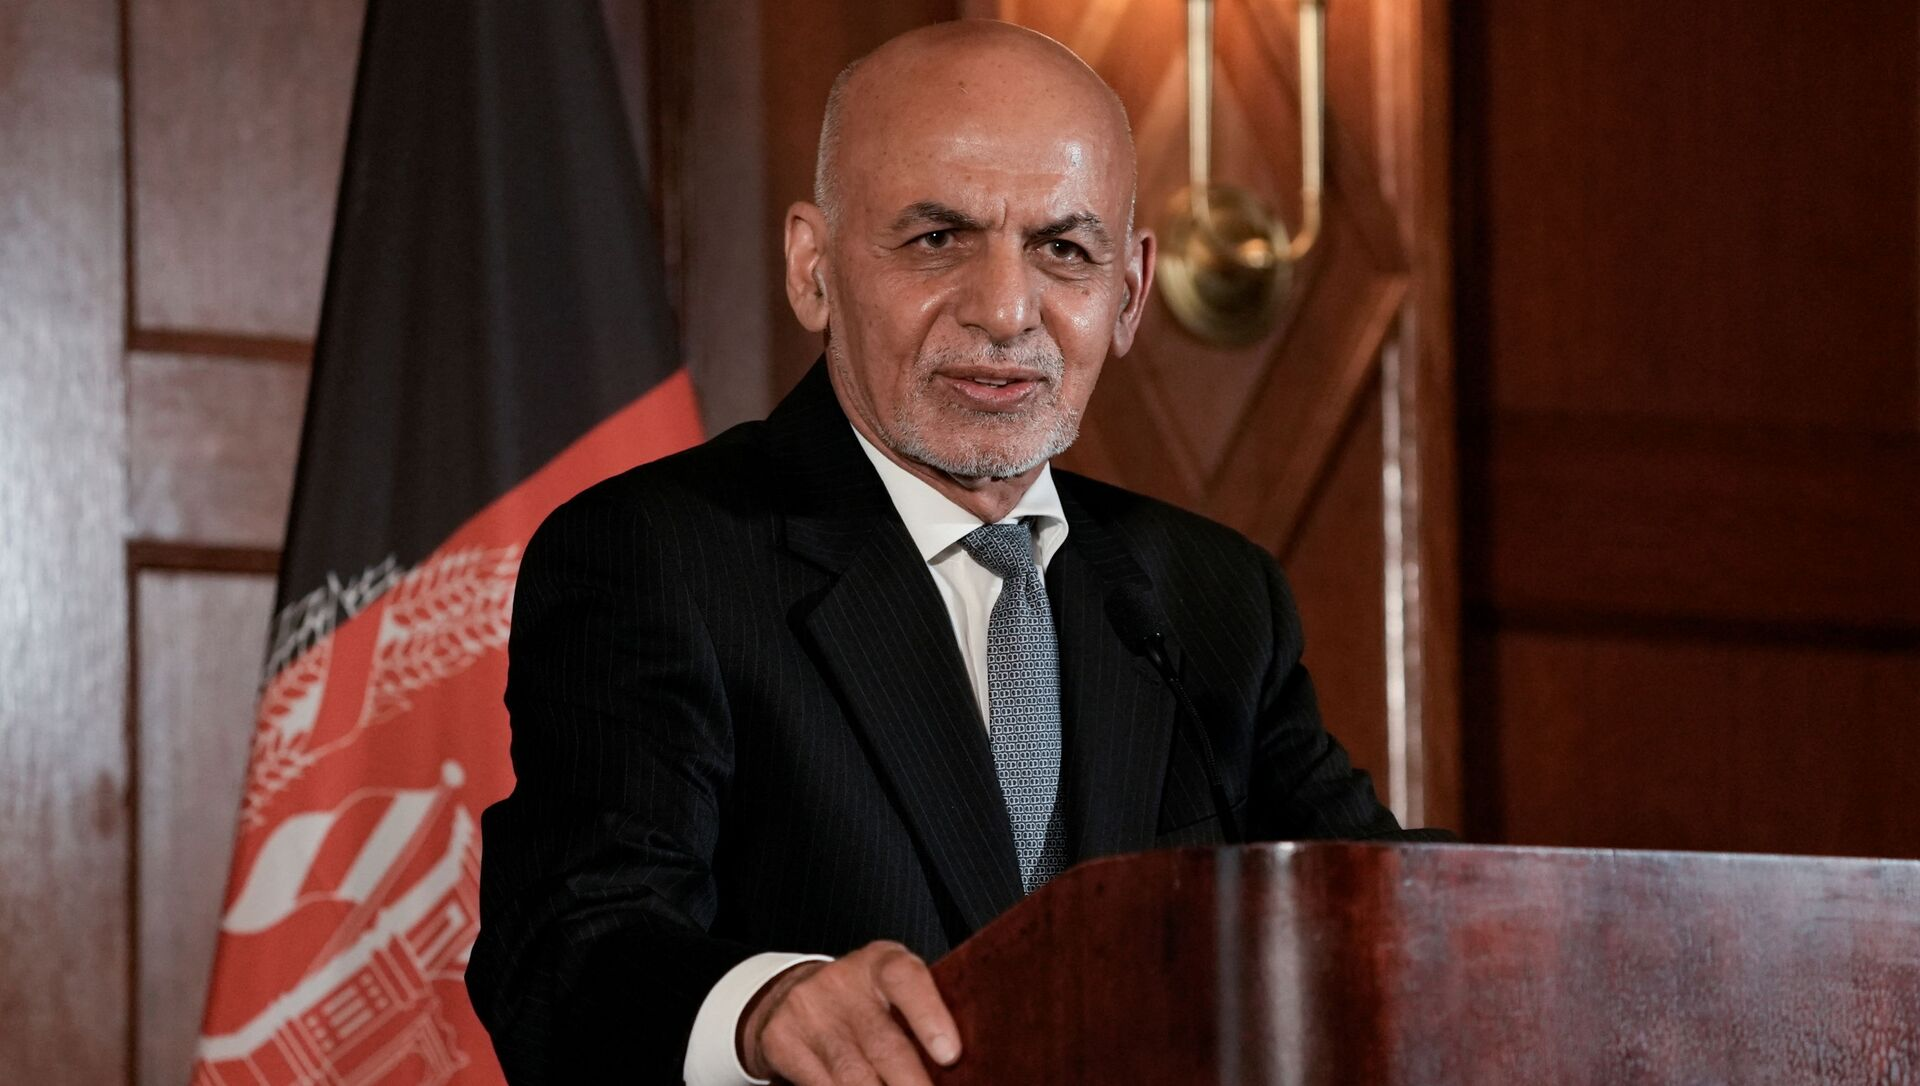 Afghanistan's President Ashraf Ghani speaks during a news conference following his meeting with U.S. President Joe Biden, at the Willard Hotel in Washington, D.C., U.S., June 25, 2021 - Sputnik International, 1920, 04.08.2021